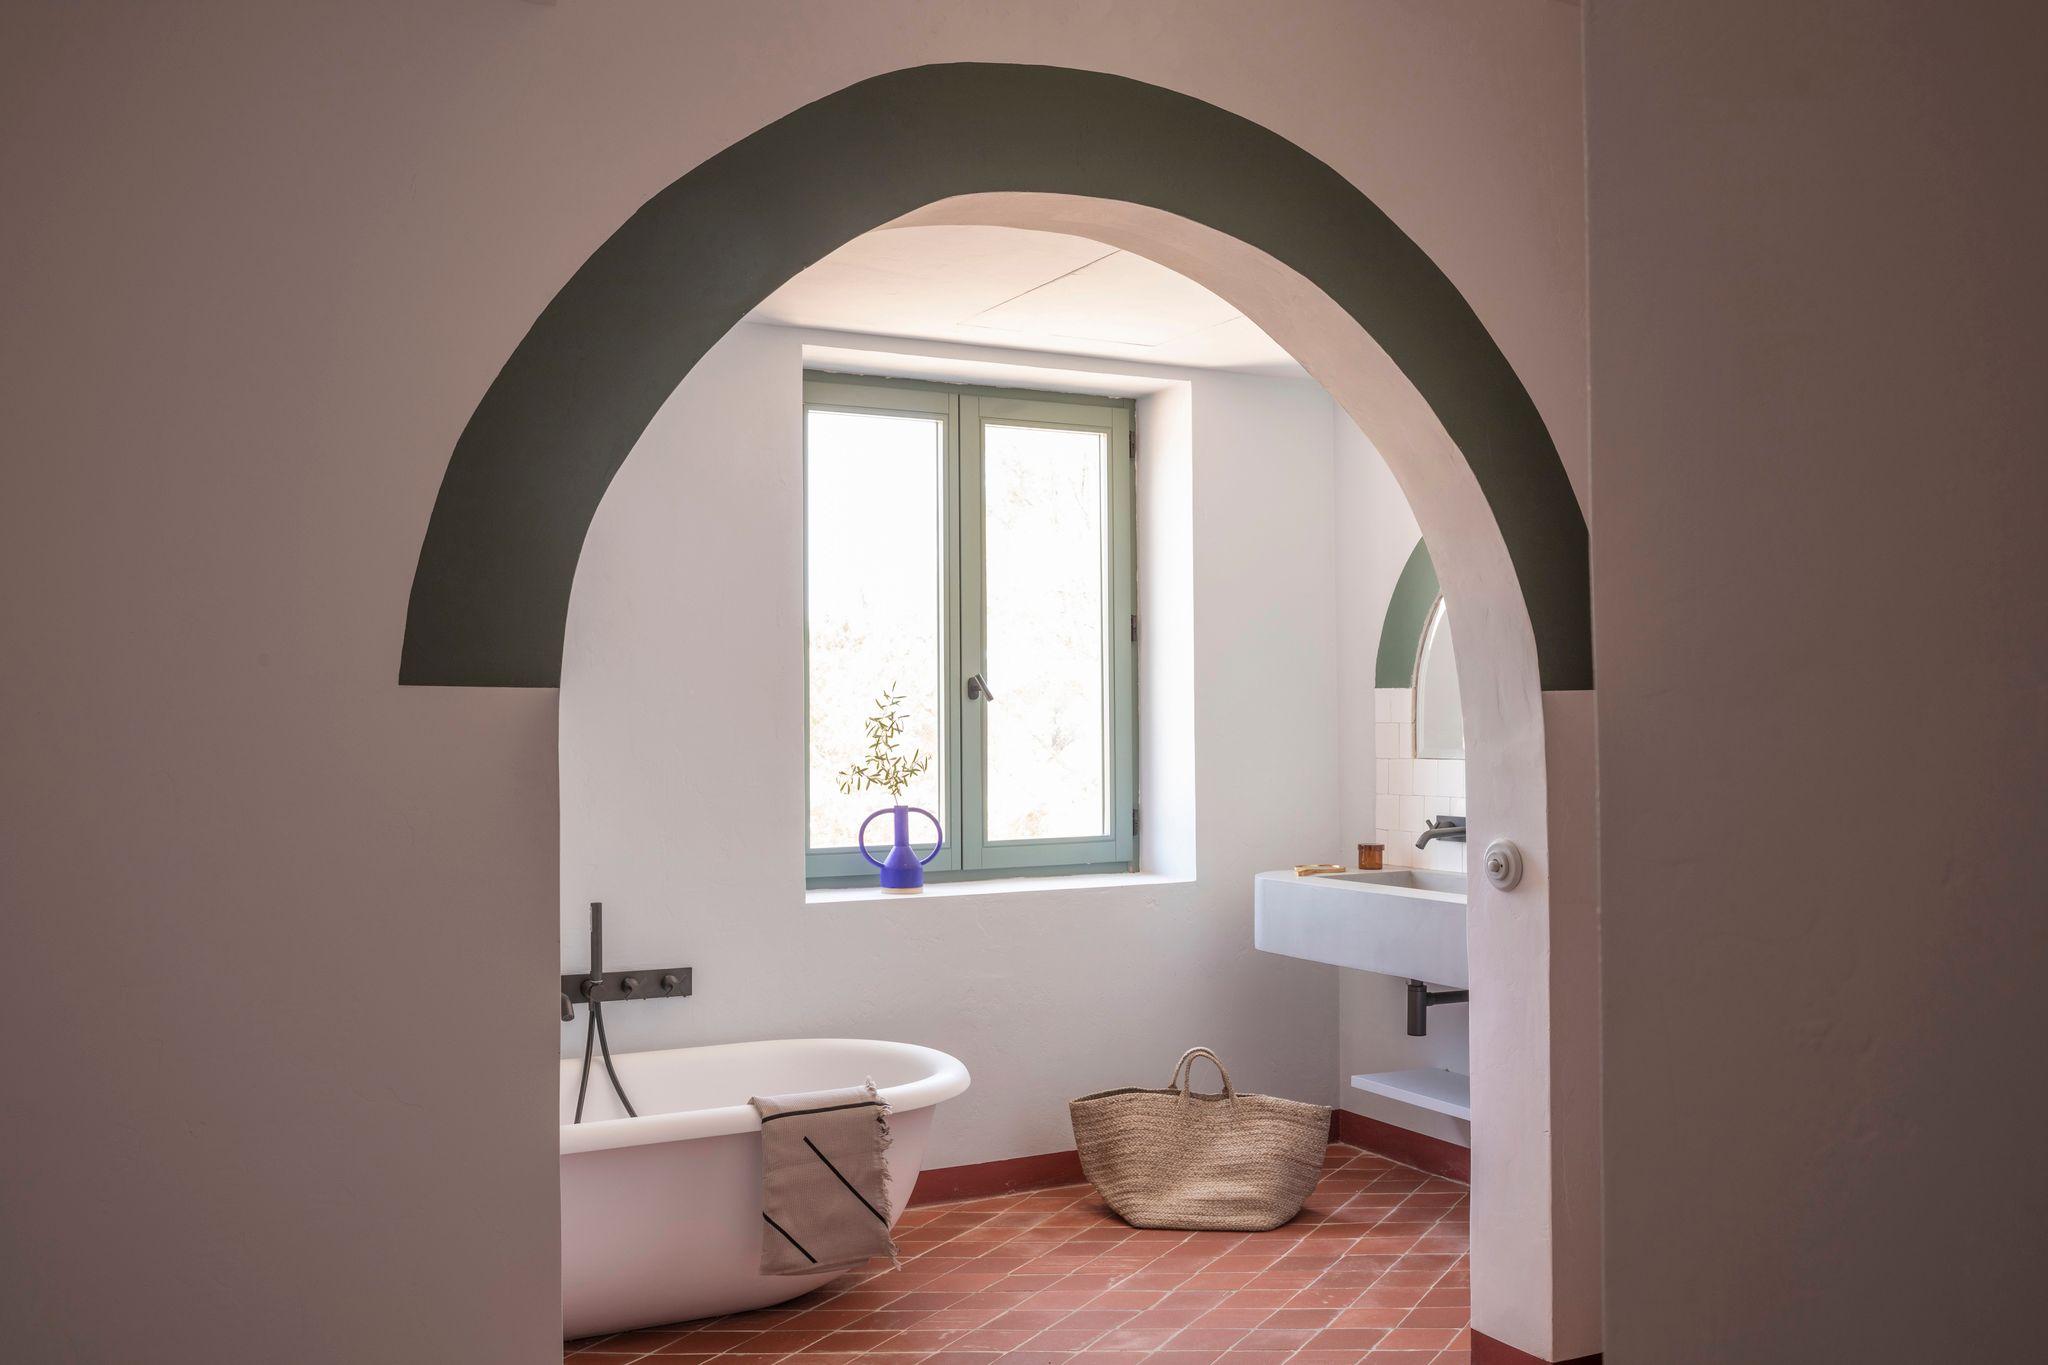 Habitación Mahon Garden 3 hotel experimental de Menorca